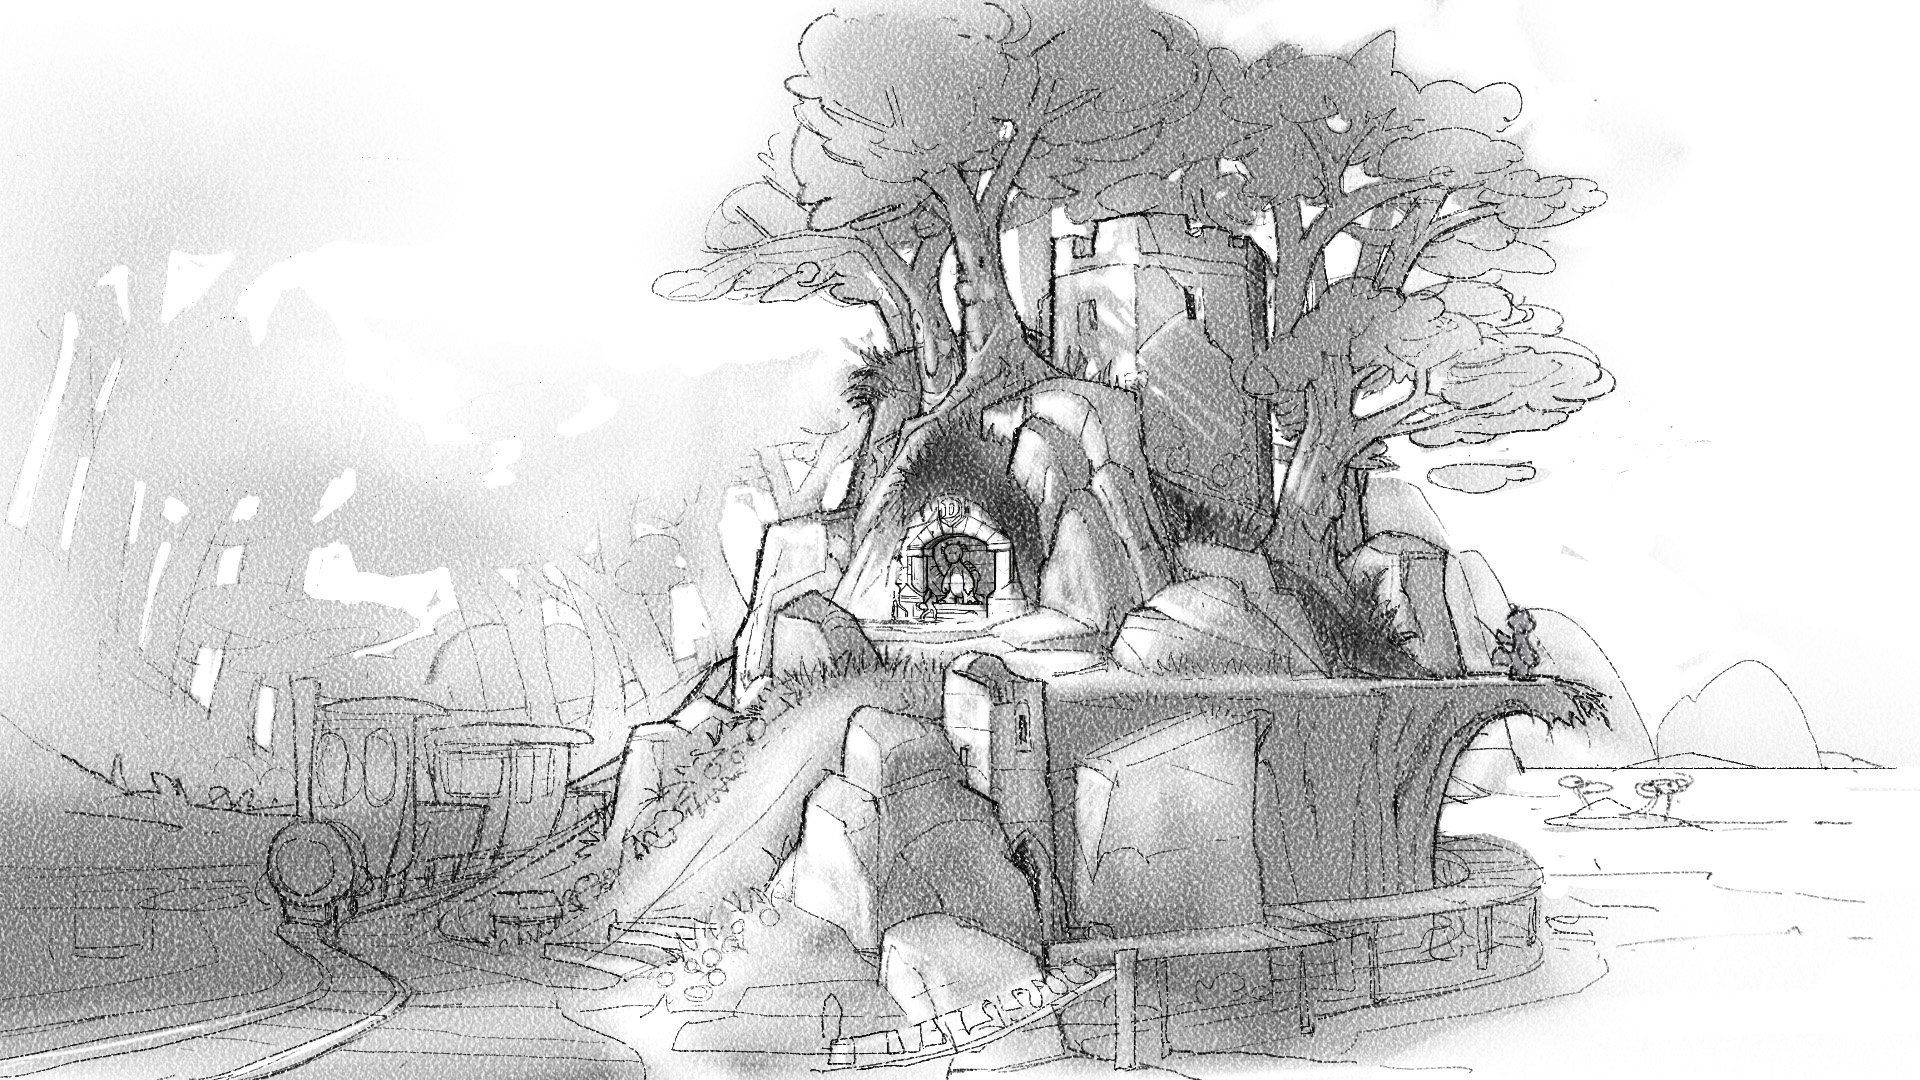 Digby's_cave_05.jpg